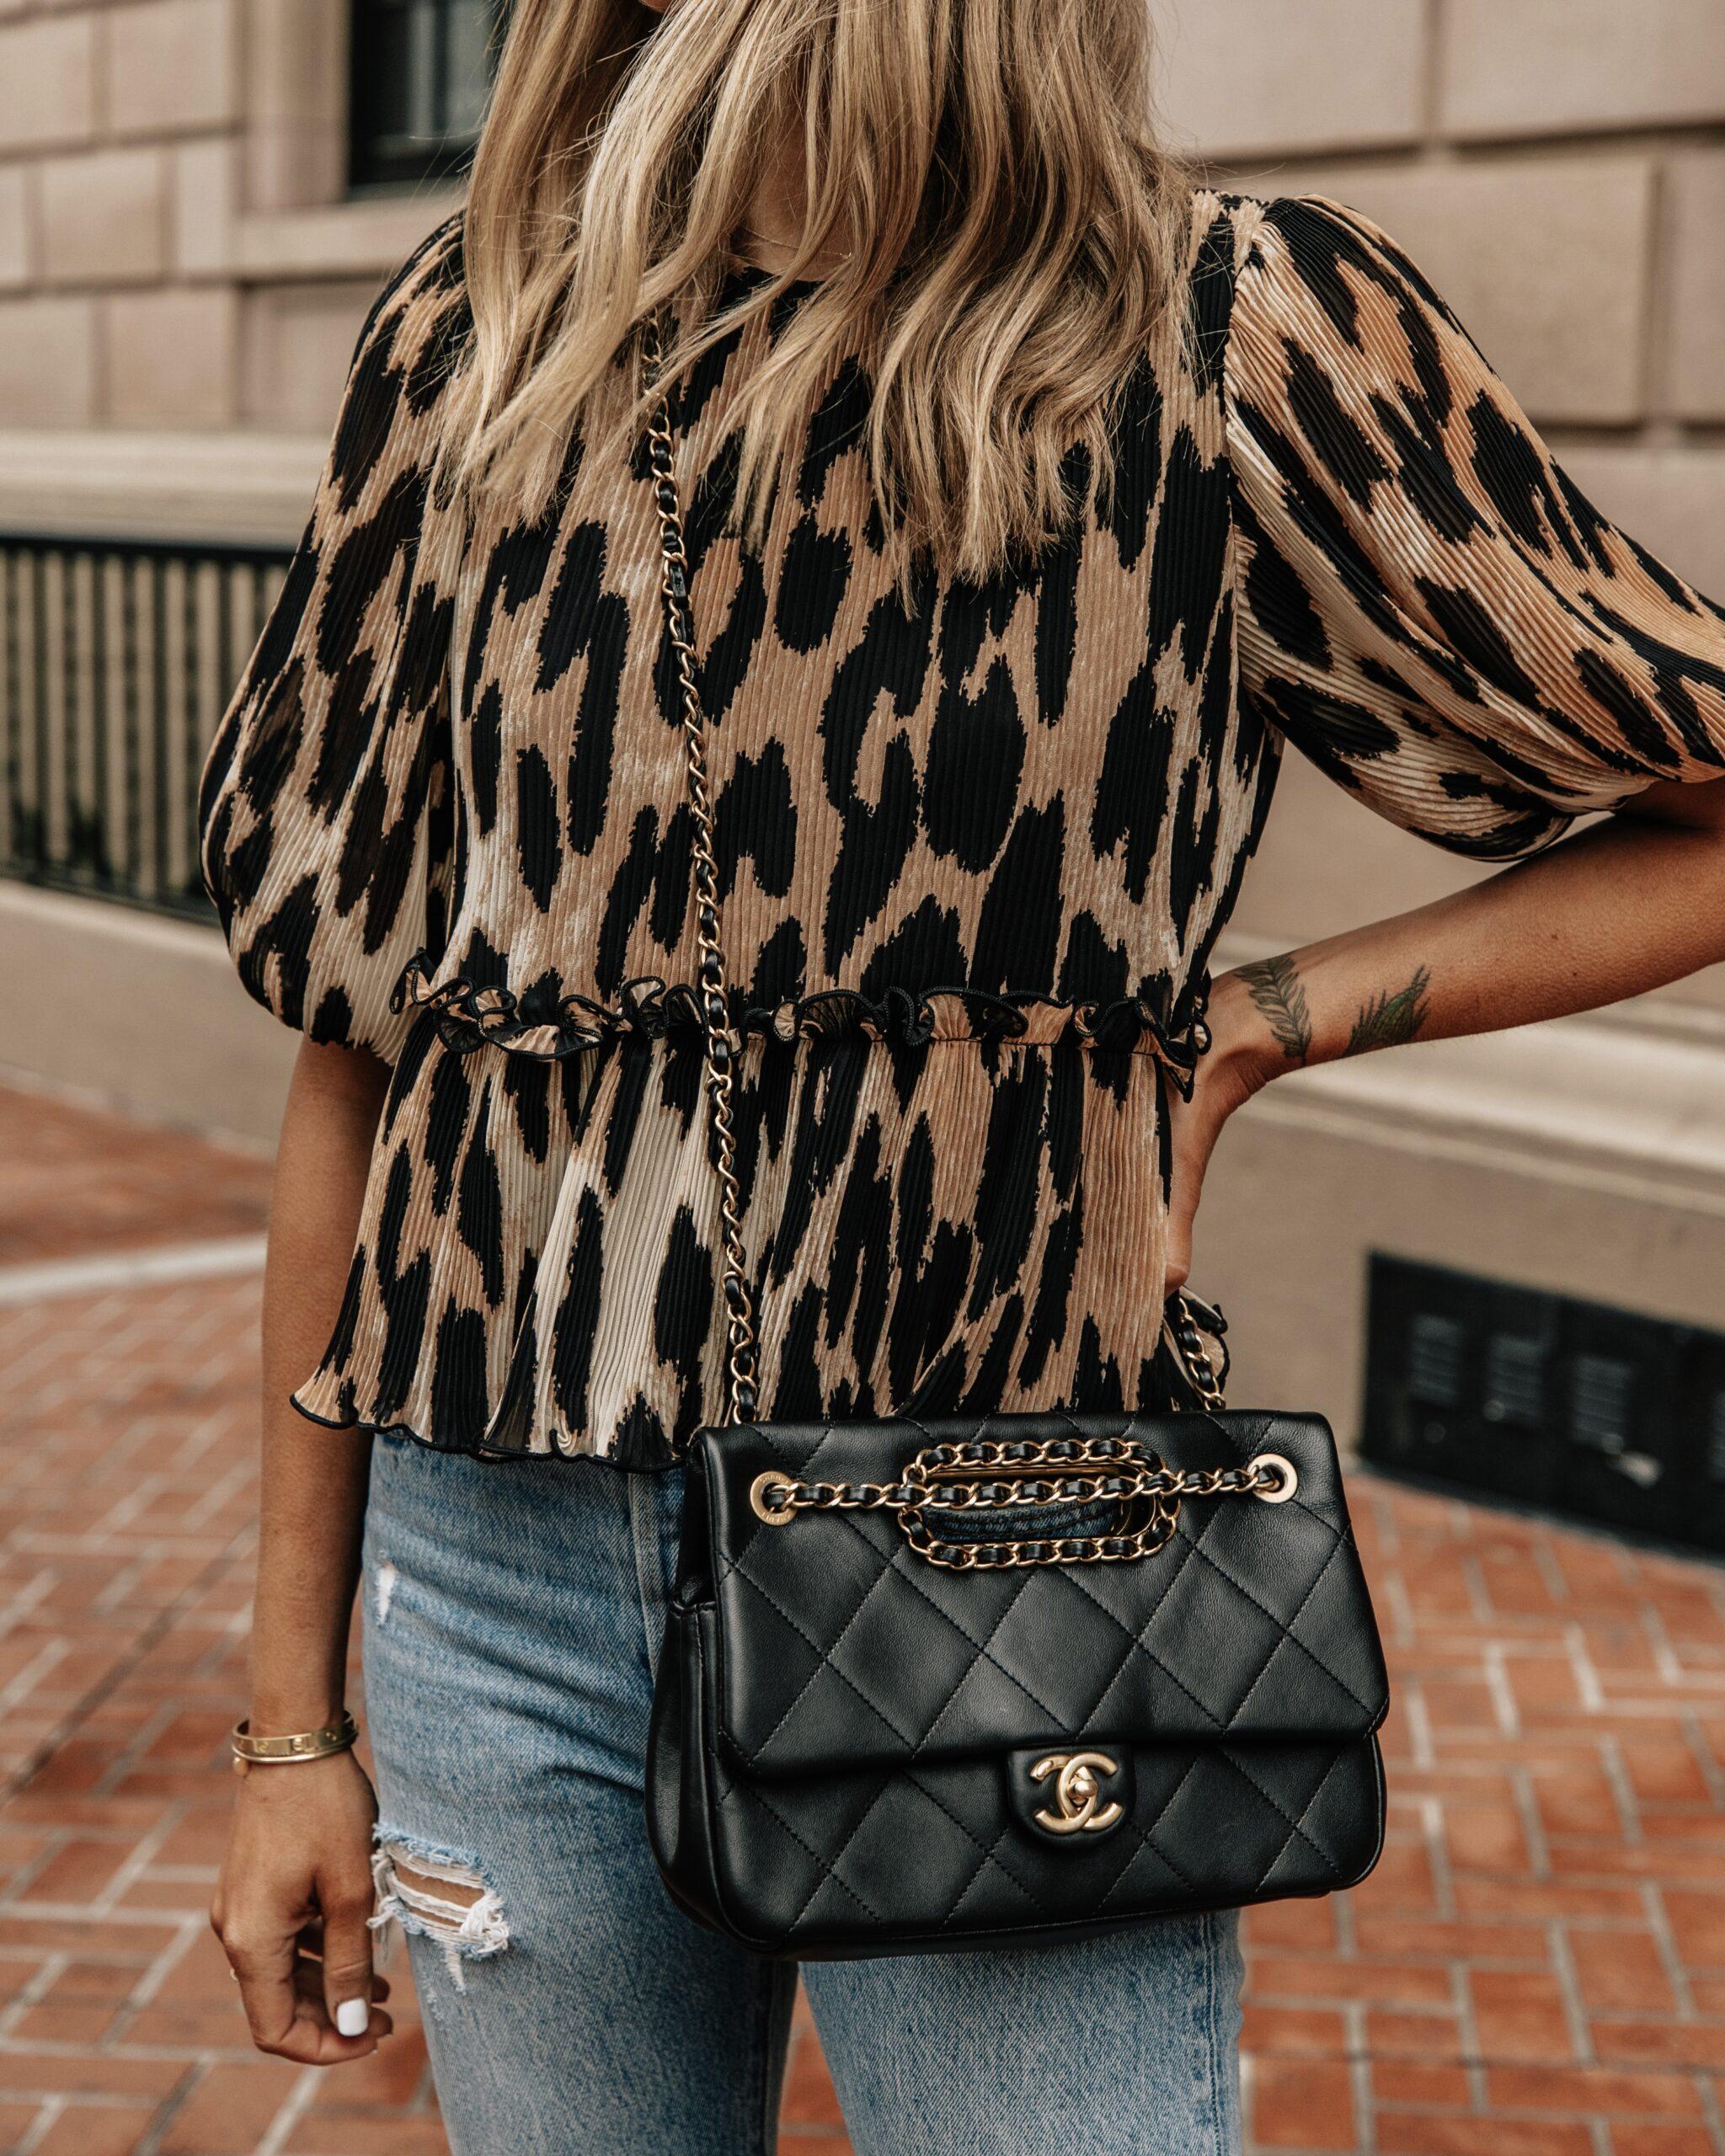 Fashion Jackson Wearing Ganni Leopard Top Levis Ripped Jeans Black Chanel Handbag 1